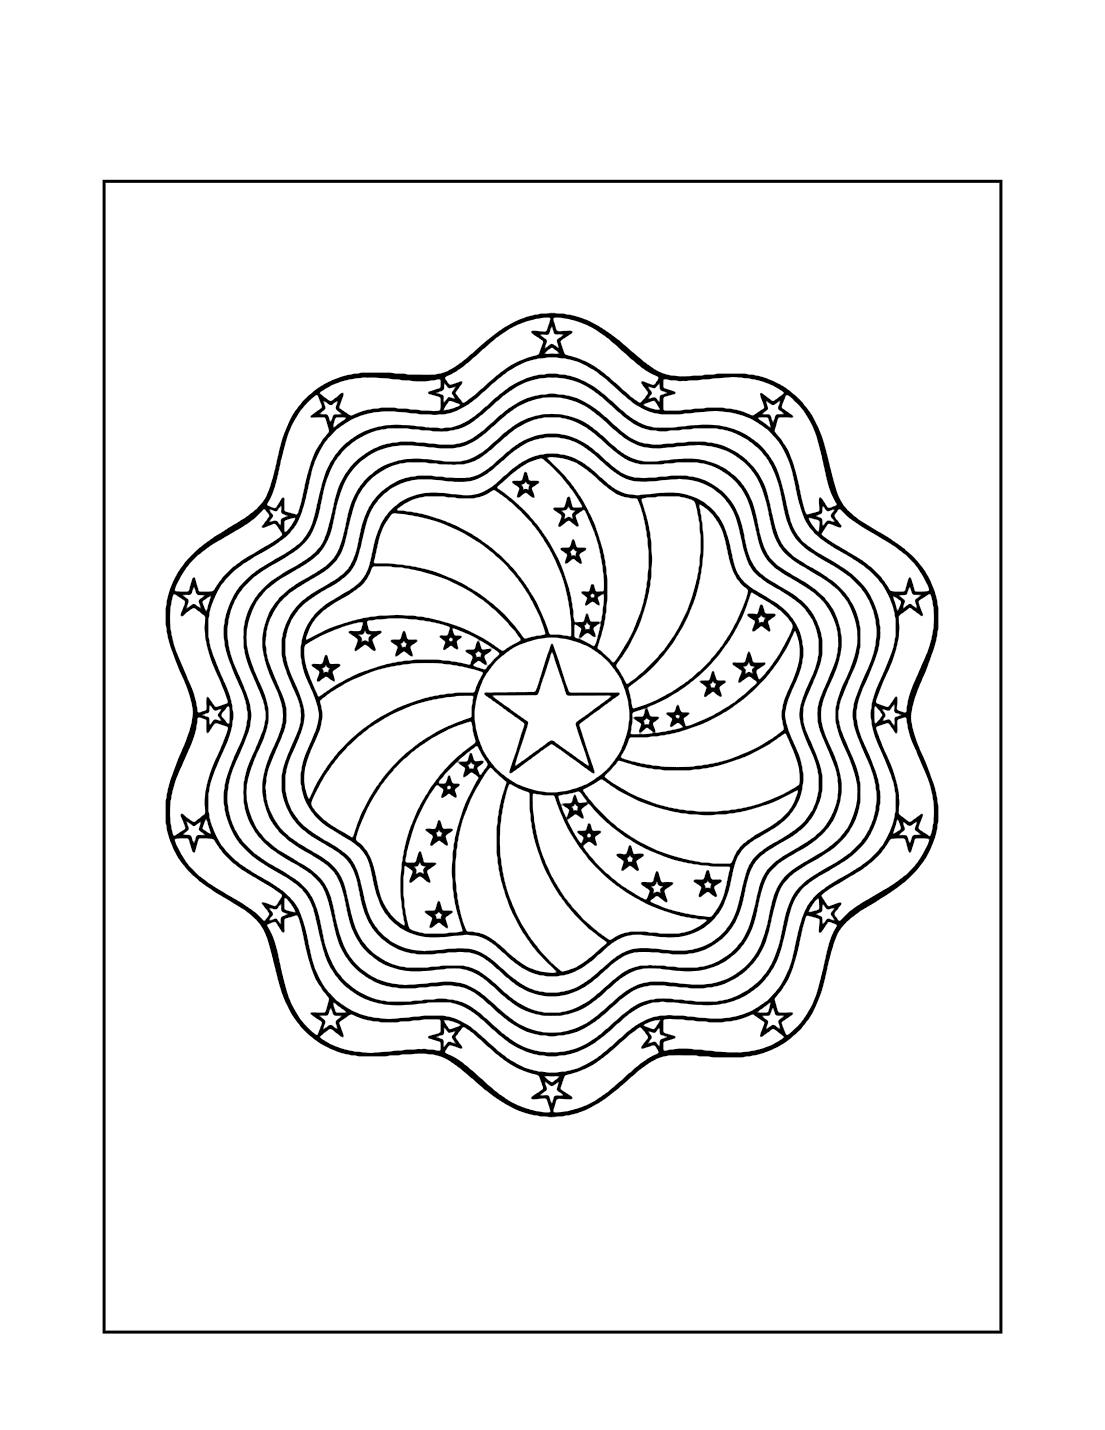 Patriotic Star Mandala Coloring Page